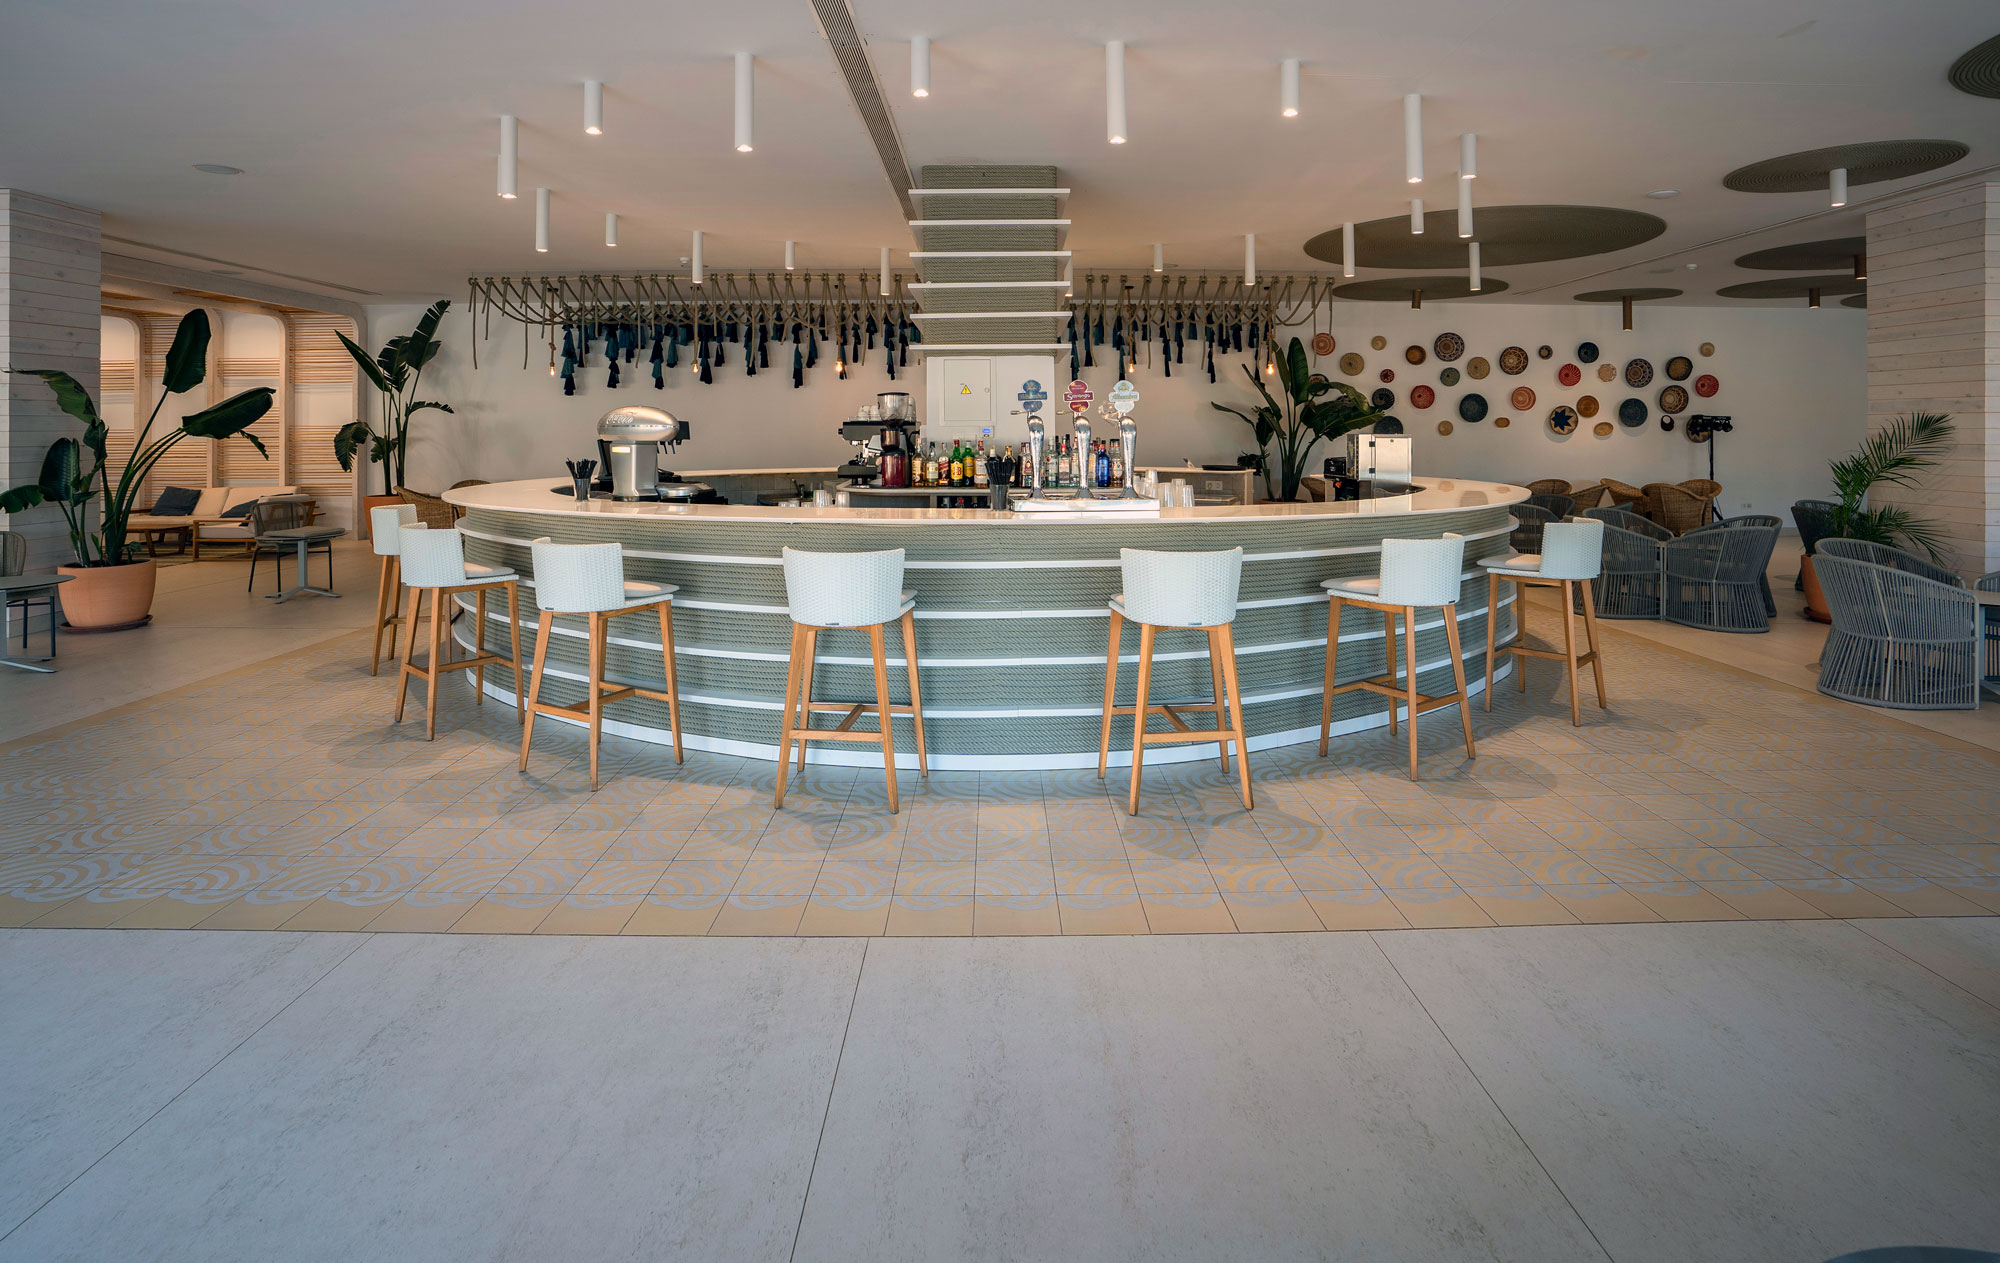 Hotel Mediterráneo  - Hotel Mediterraneo Park 7 Dekton Silestone Piedra Natural Cosentino 53